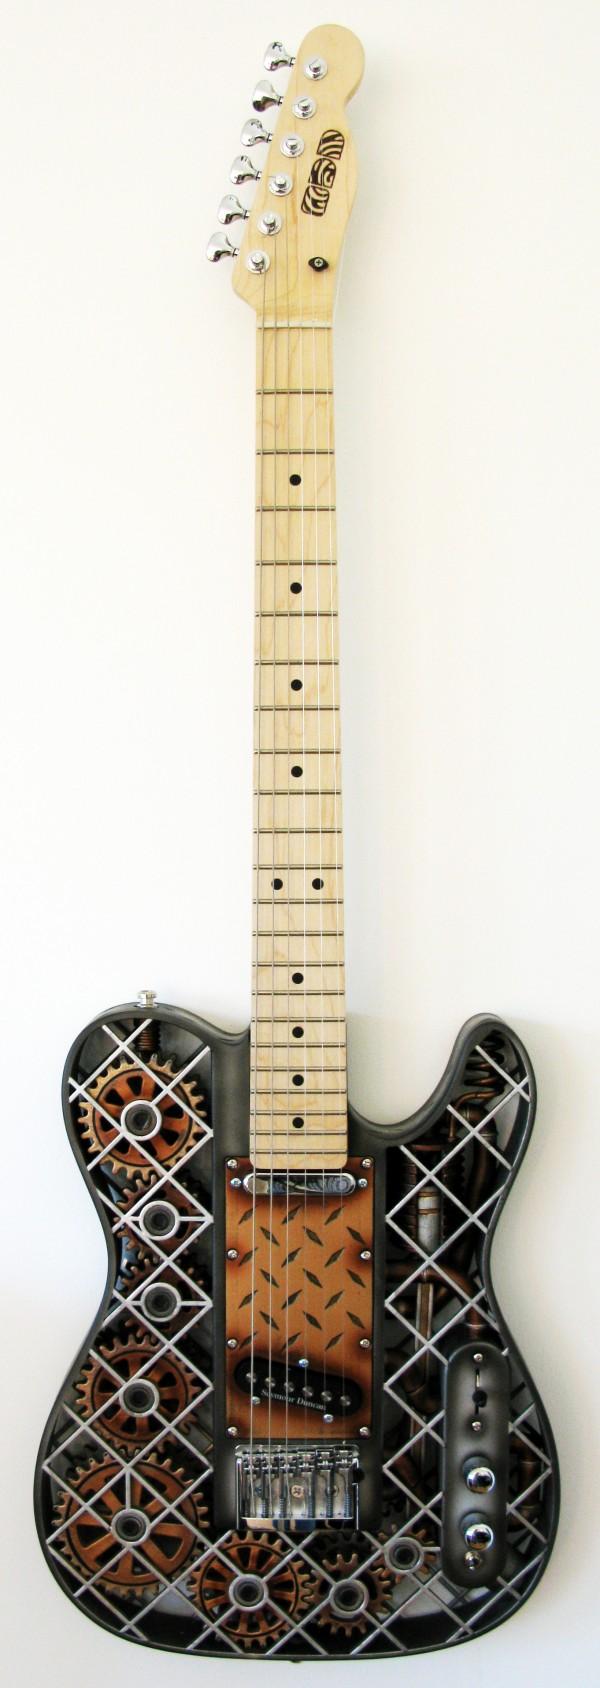 diseño victoriano guitarra steampunk